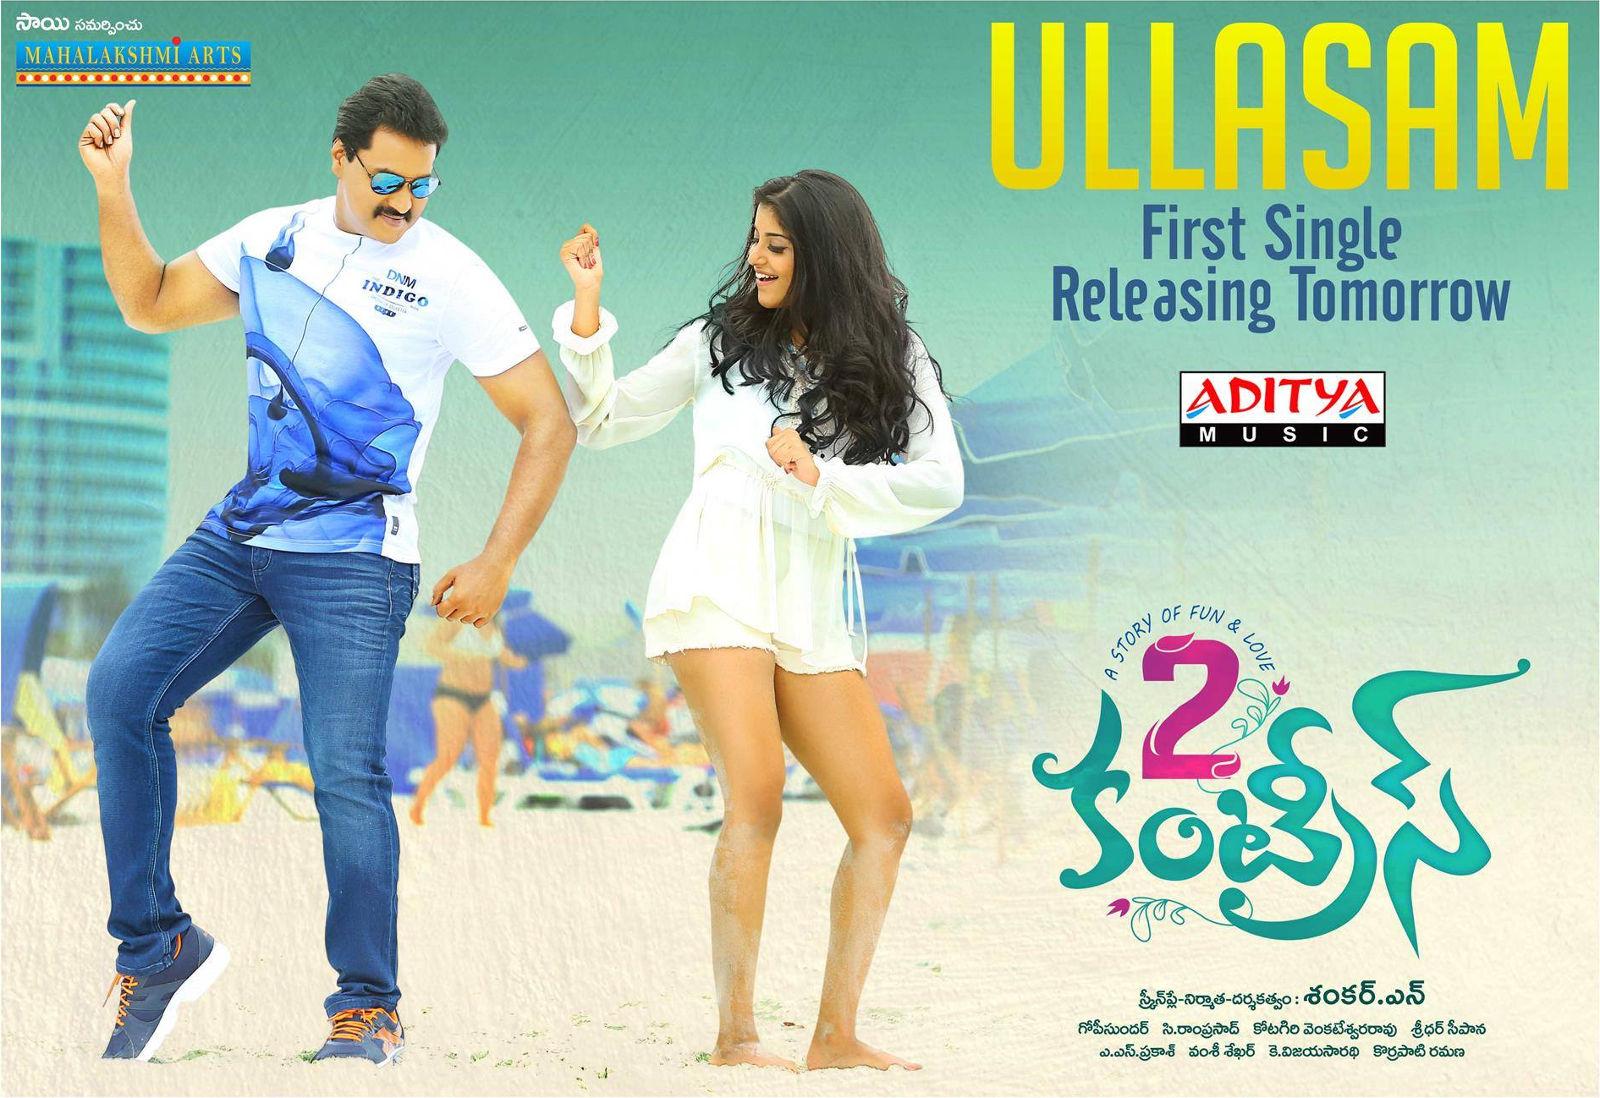 Sunil Manisha Raj 2 Countries Movie Ullasam First Single Song Releasing Tomorrow Wallpaper